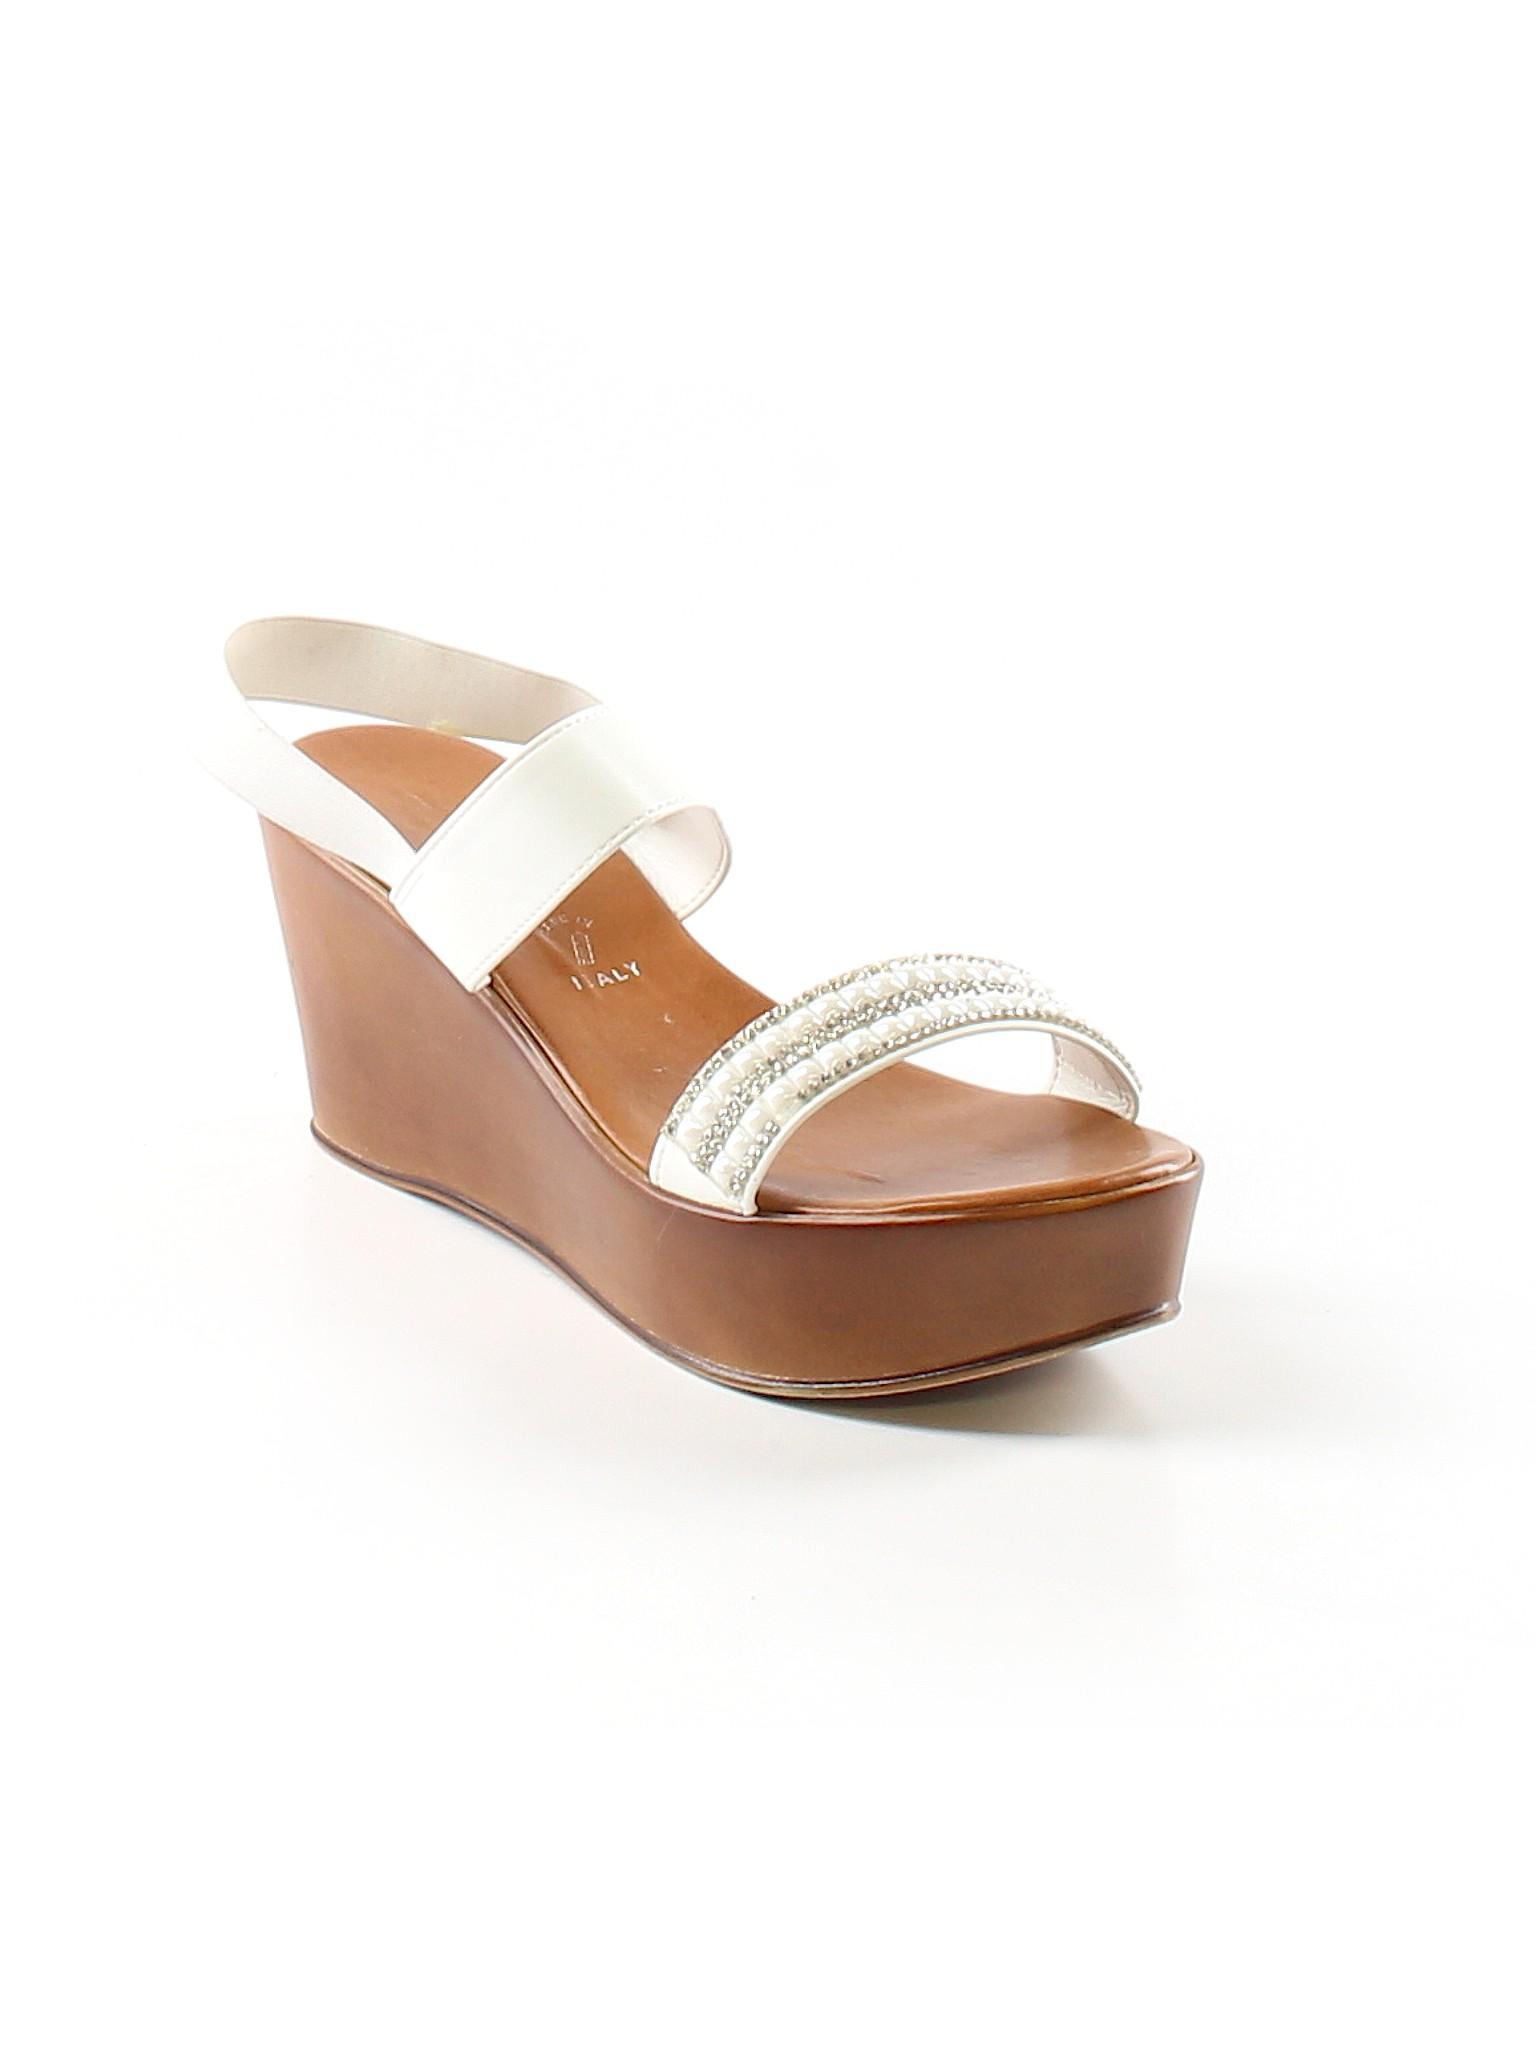 Shoemakers Boutique Footwear promotion Wedges Italian wT6qETrFx